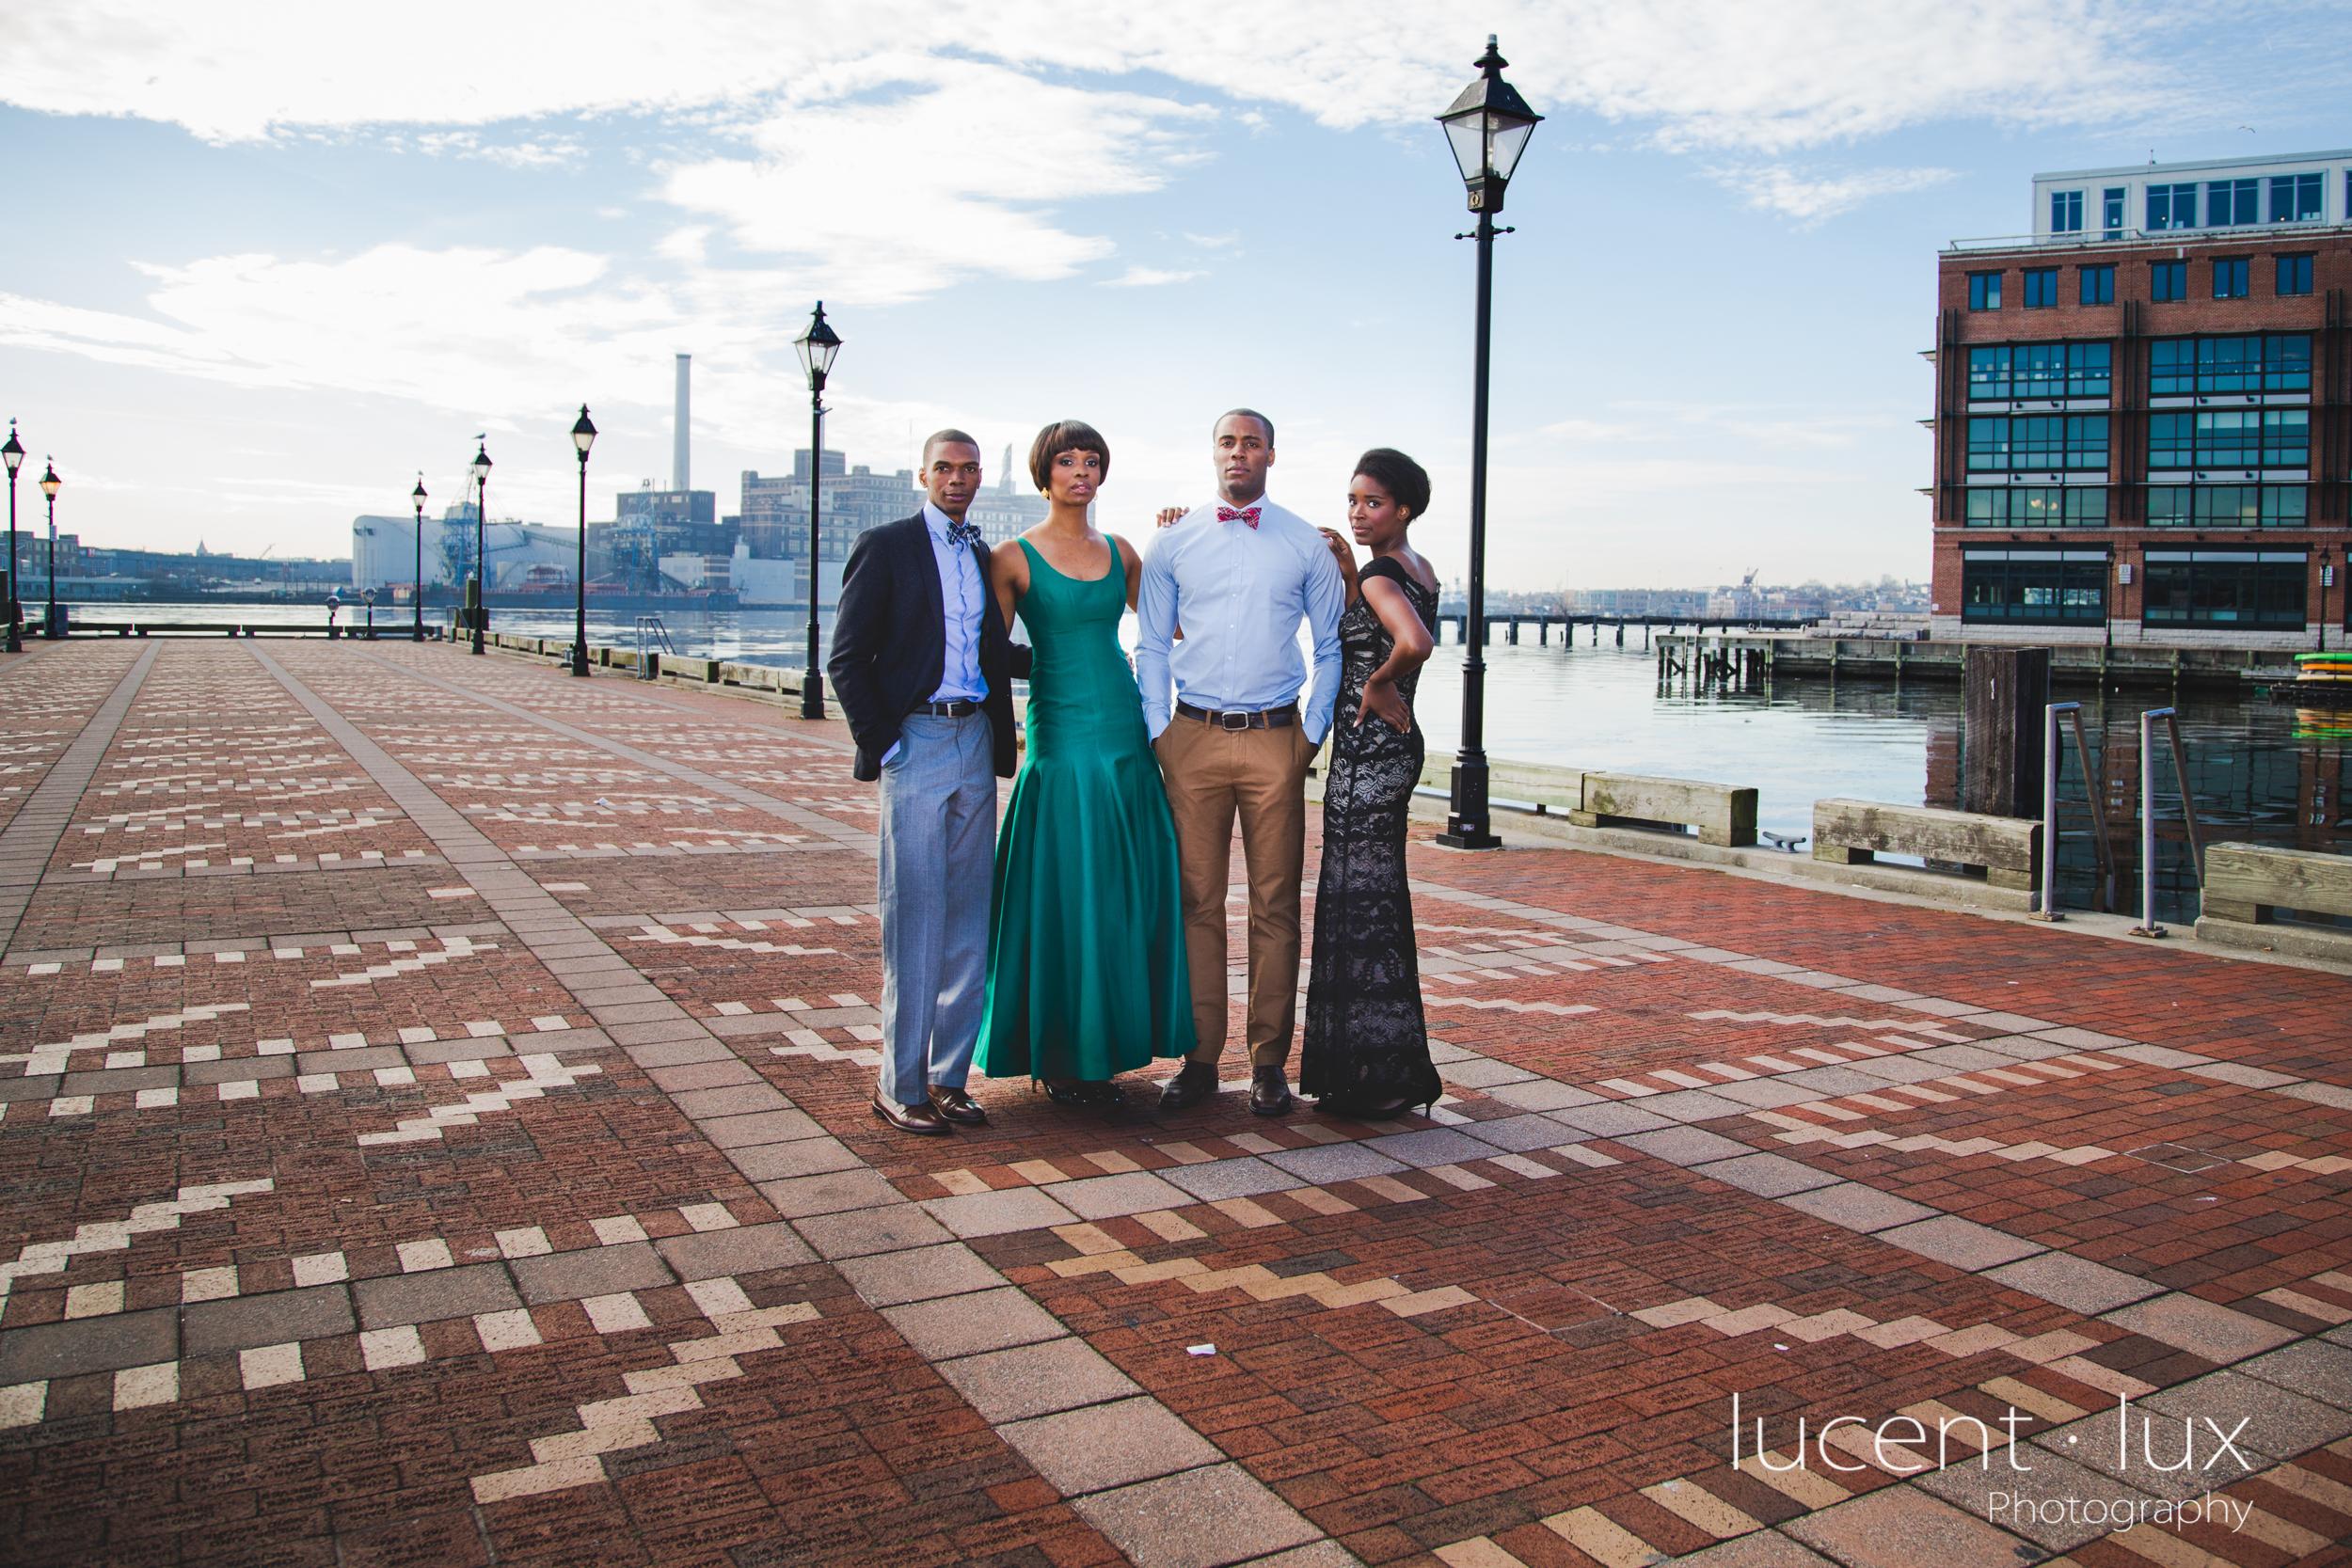 Fells-Point-Baltimore-Maryland-Photography-Photographer-Family-Portraits-Fells-Point-105.jpg